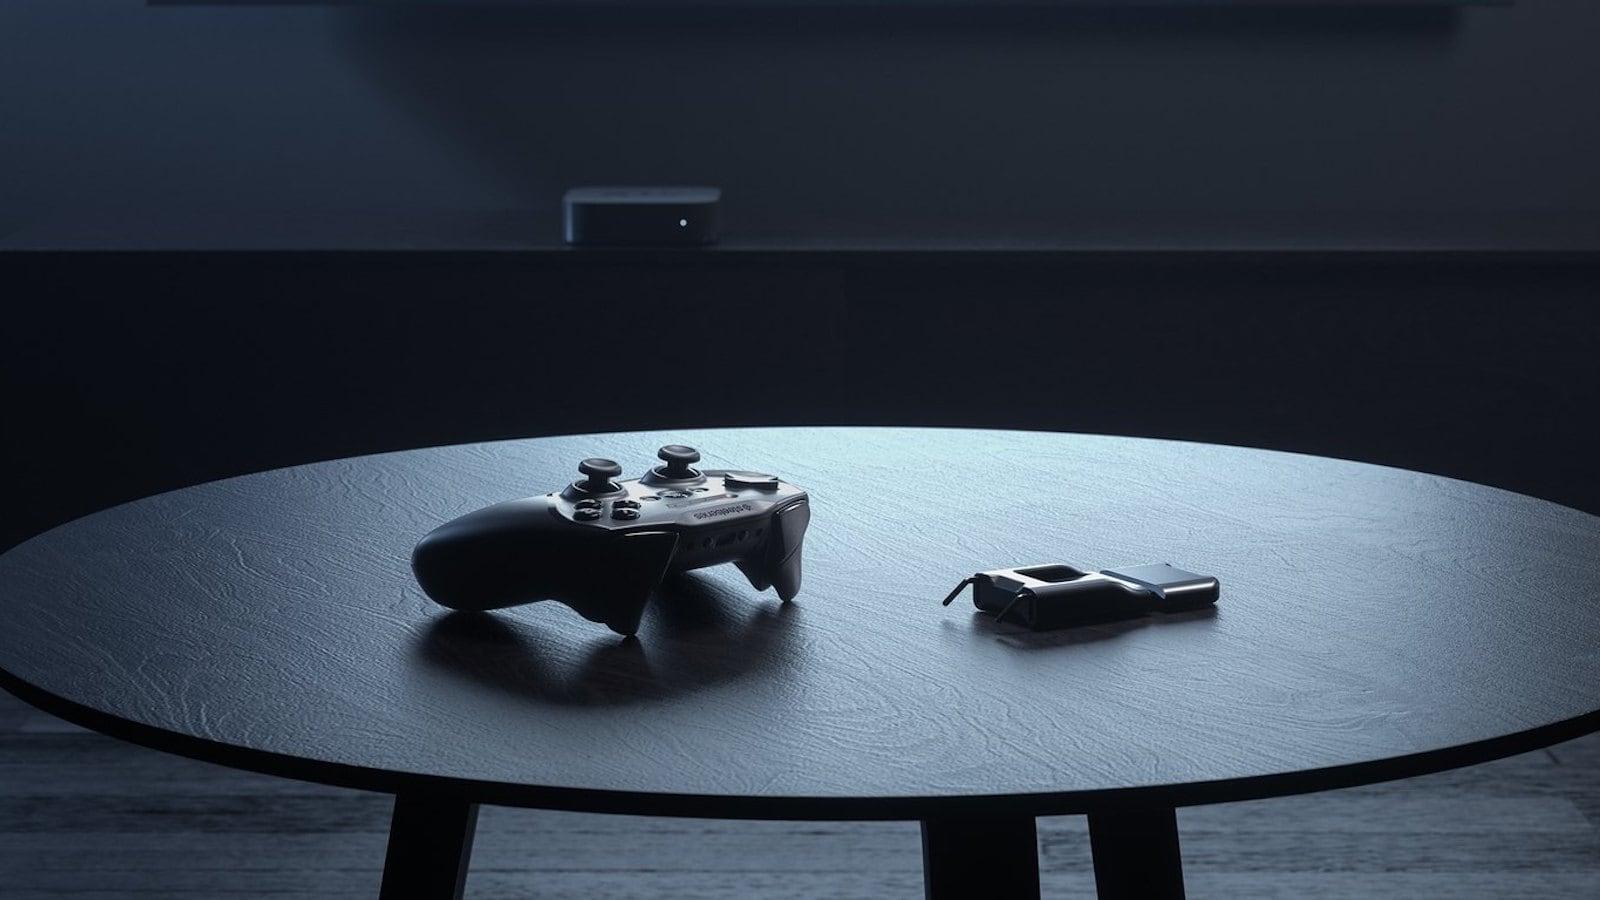 SteelSeries NIMBUS+ Apple Gaming Controller